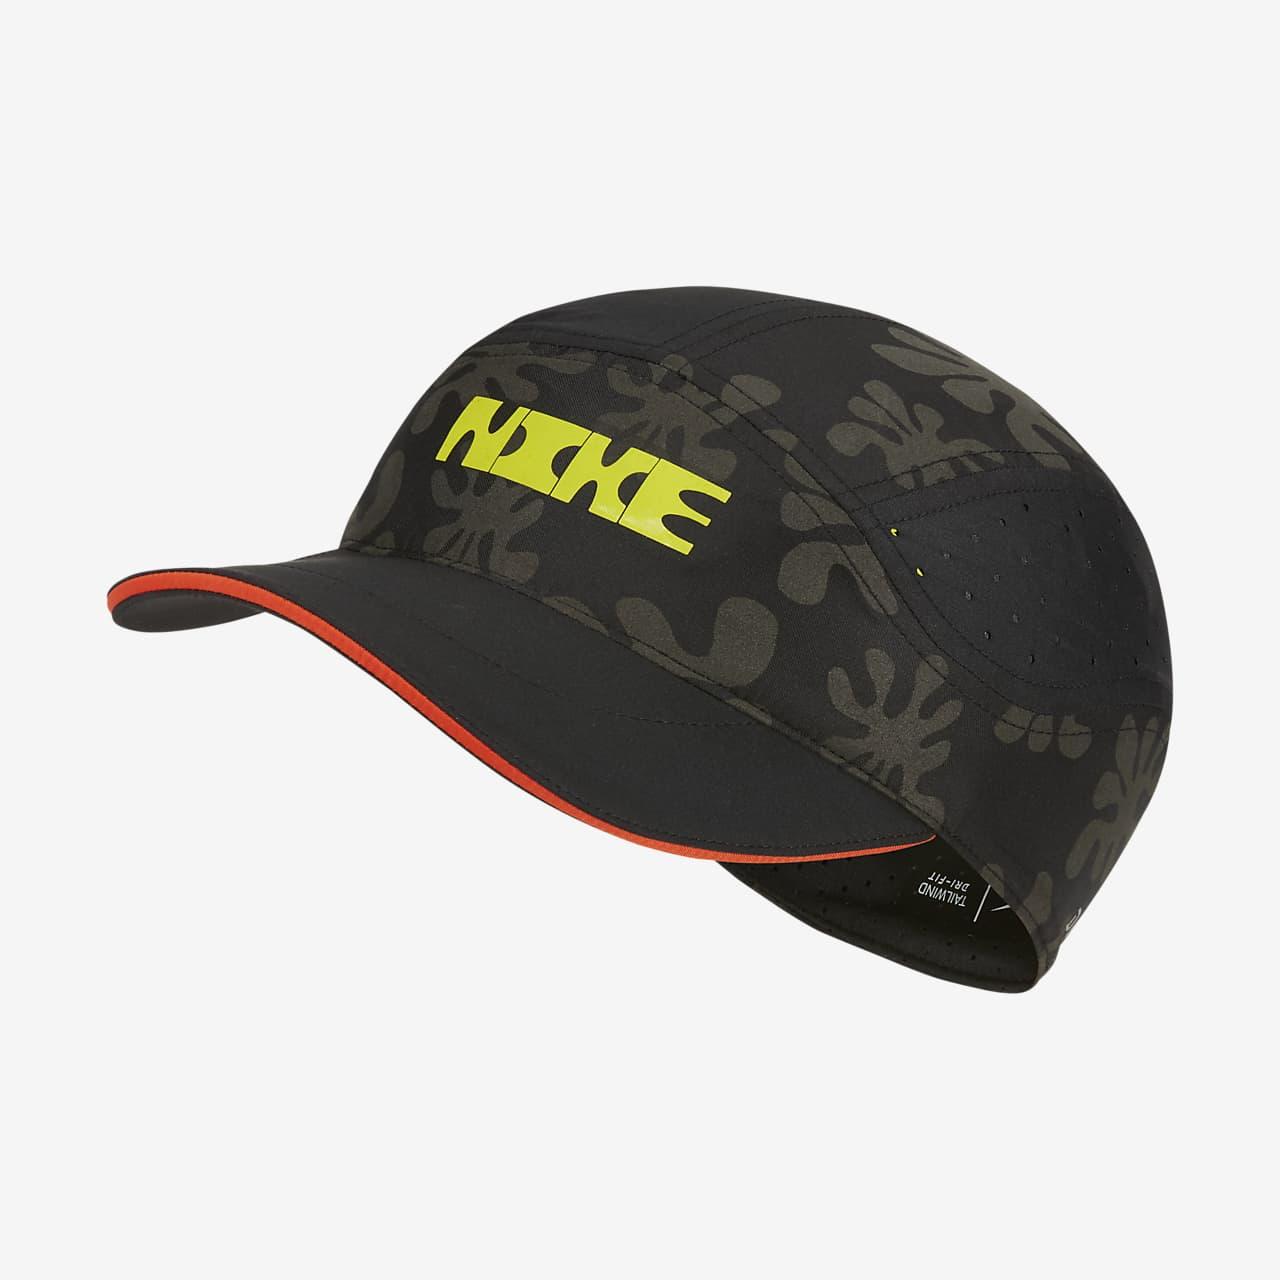 Nike Aerobill Tailwind A.I.R. หมวกแก๊ปวิ่ง Chaz Bear